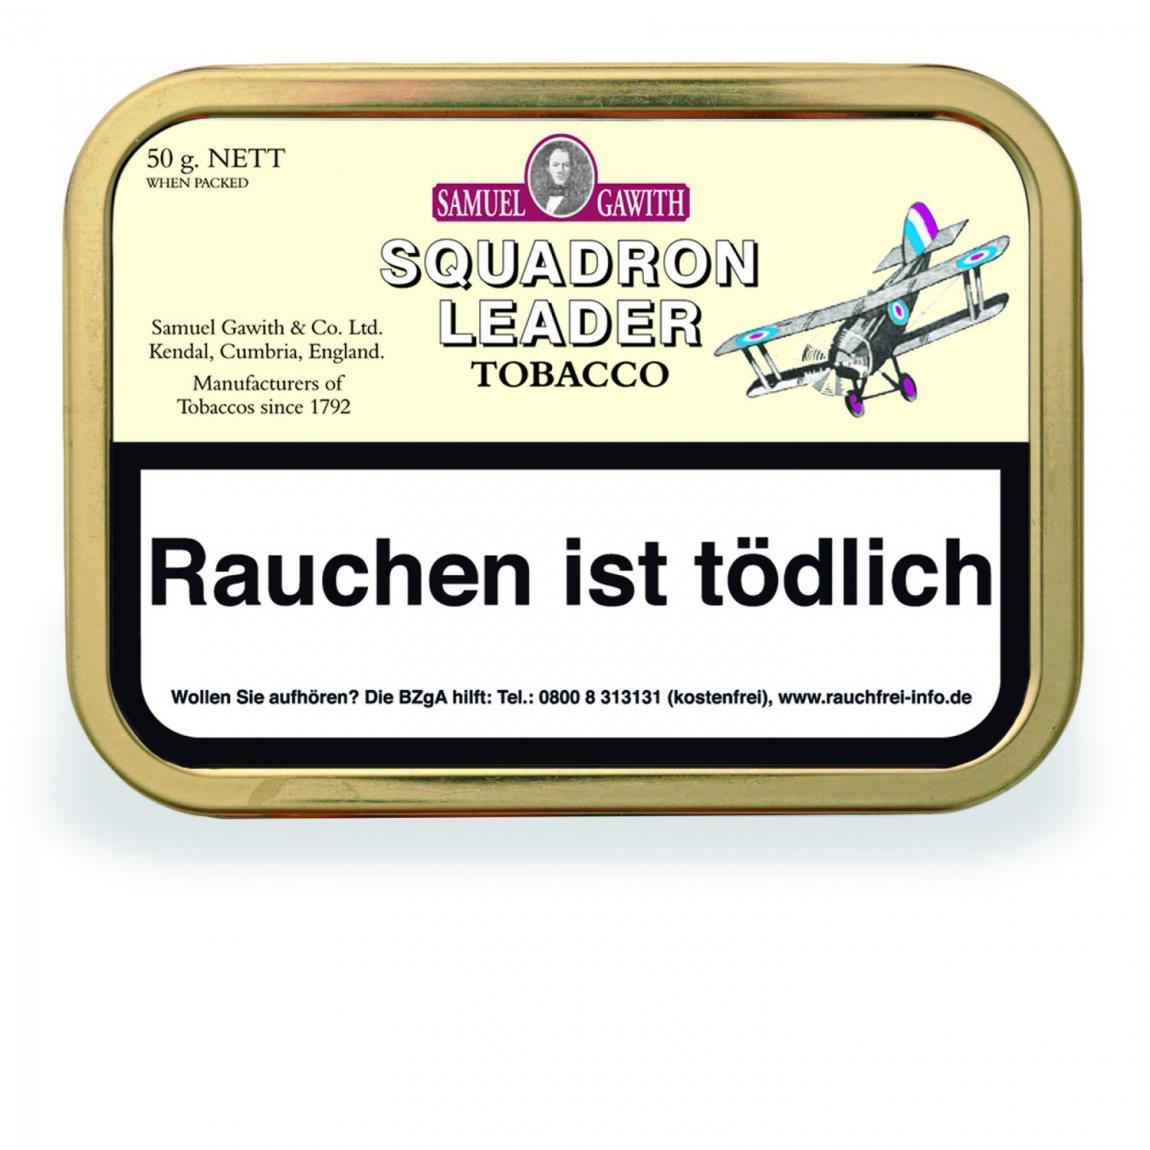 Samuel Gawith »Squadron Leader Tobacco«